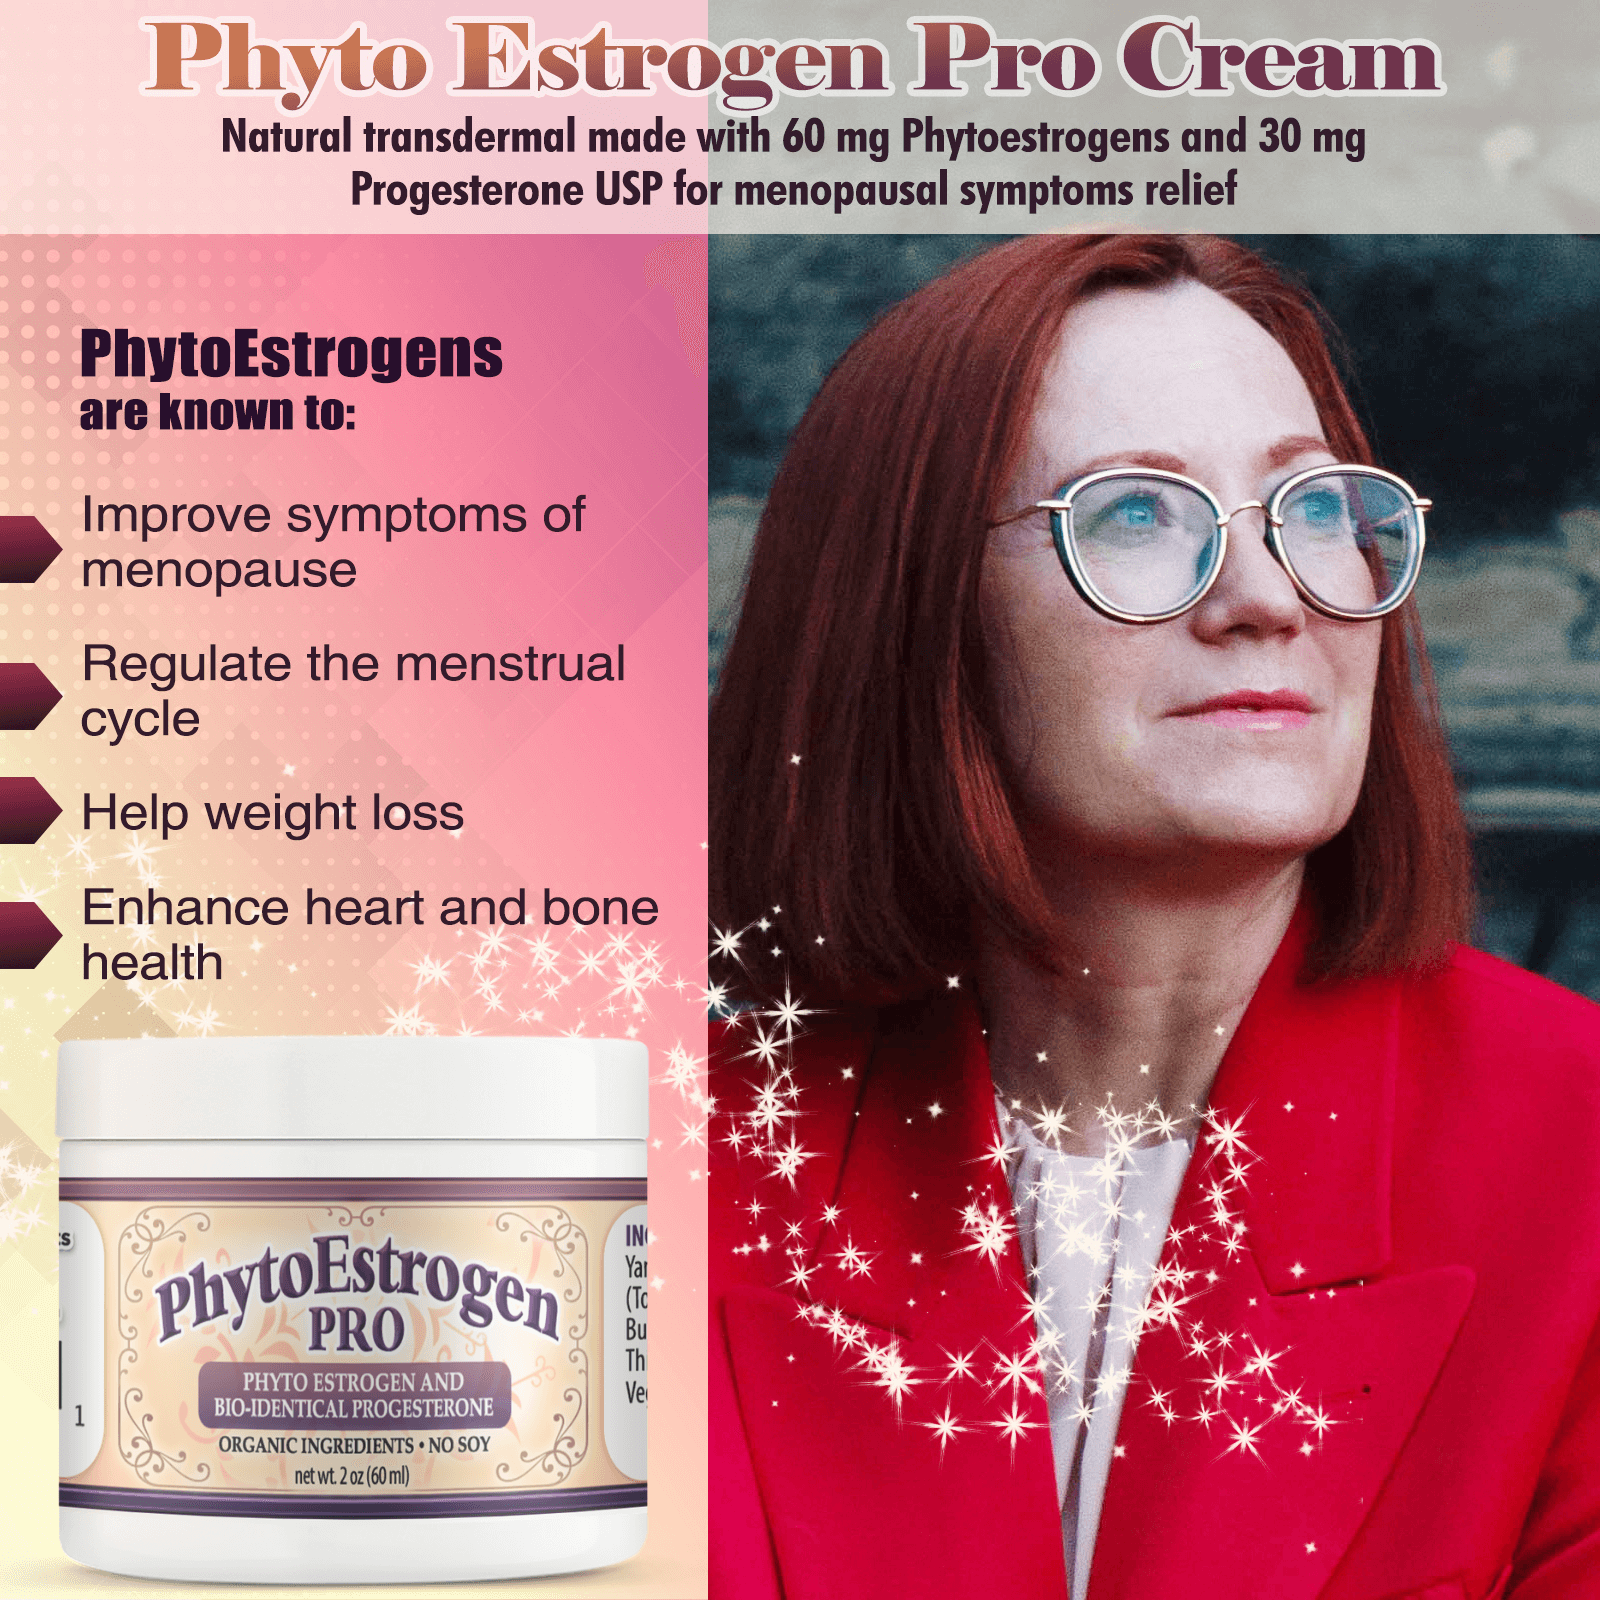 PhytoEstrogen Cream for Menopausal Symptom Relief Infographics